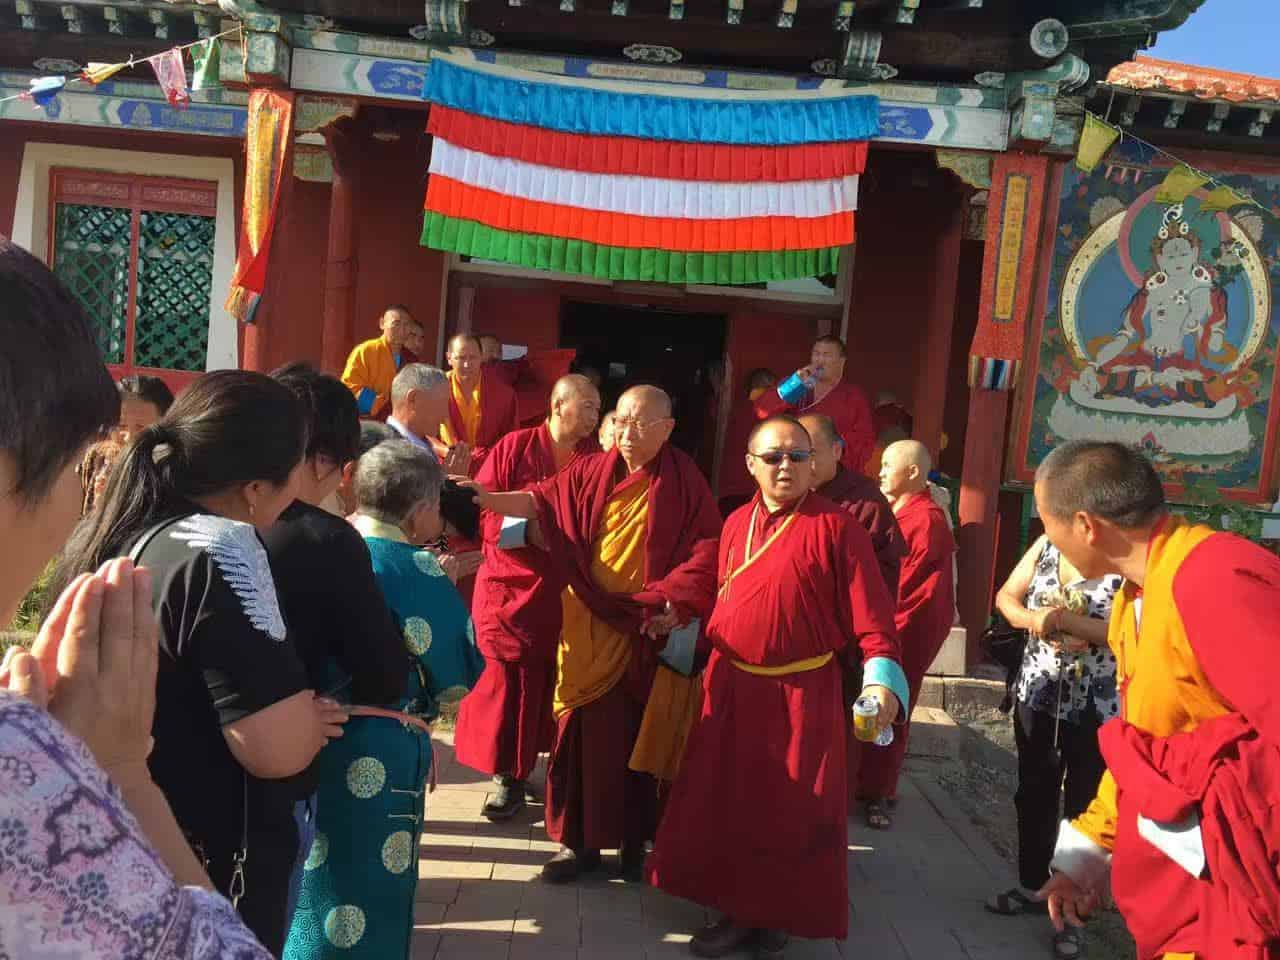 gosok-rinpoche-mongolia-2016-f3501a23a5543589a63fc2fb2eb49e1